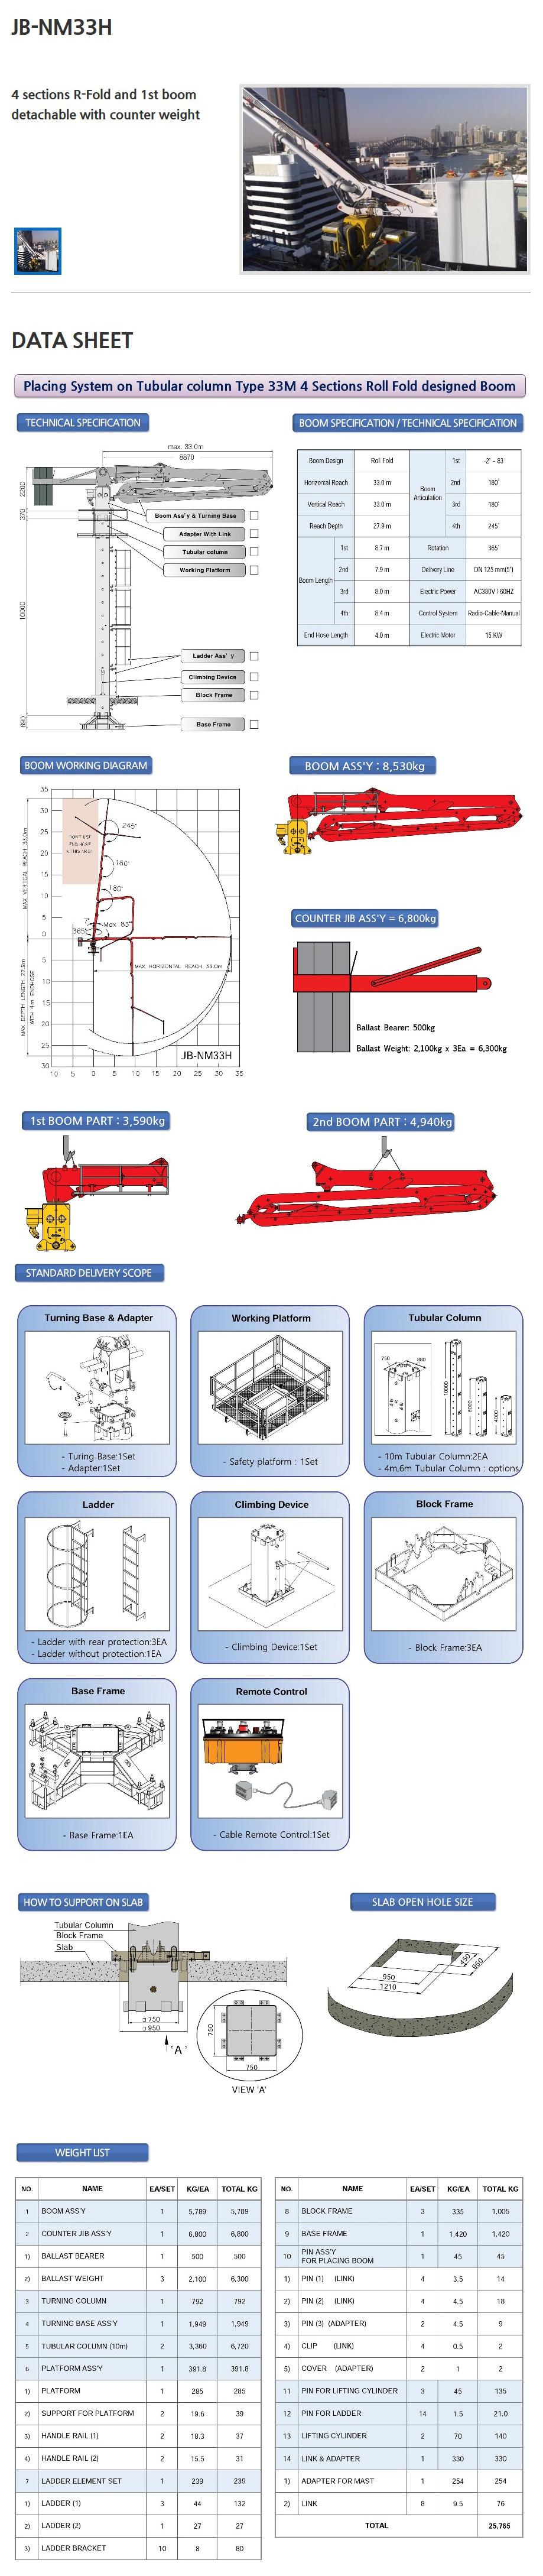 JUNJIN Placing Boom (Tubular Colunm Type with Counter Weight) JB-NM33H